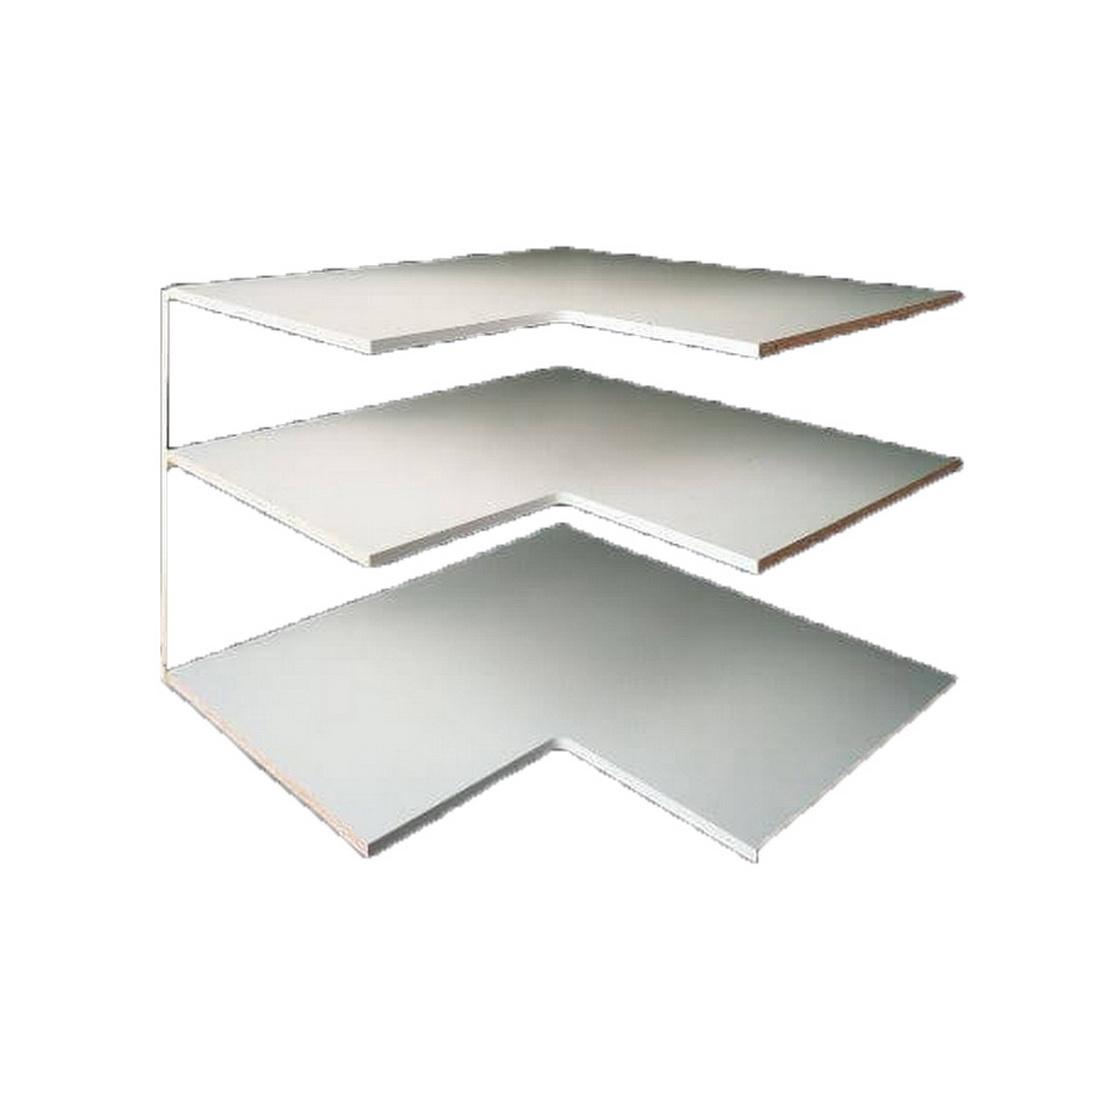 Laminex Whiteboard MDF Panel 2440 x 1220 x 18mm Satin 872712